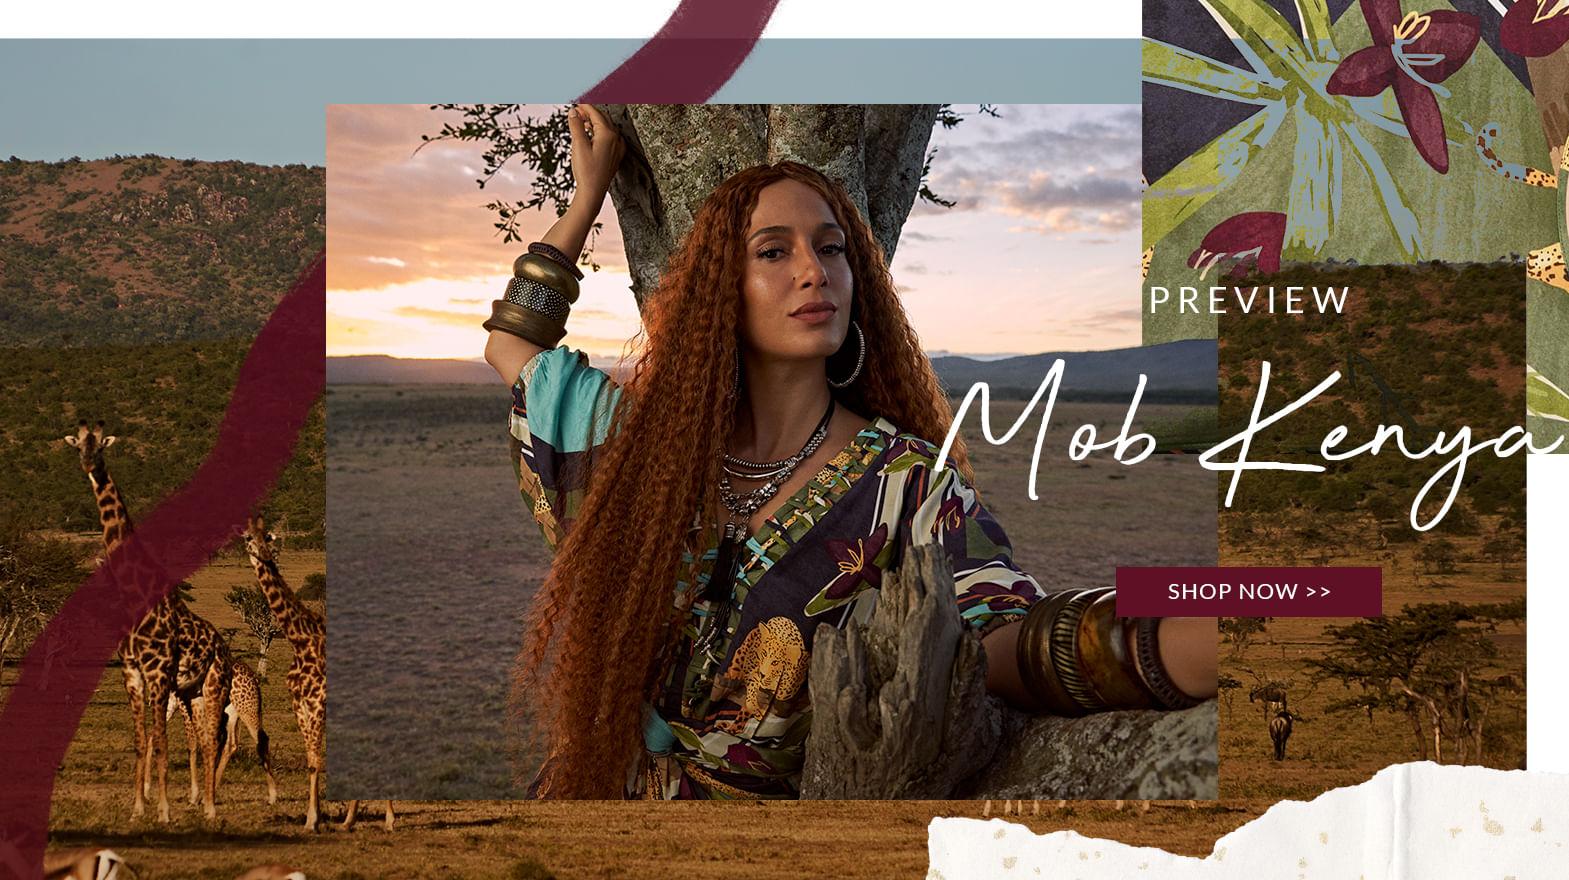 11d13059bd MOB | Roupas Femininas e Acessórios da Moda | Compre Online!